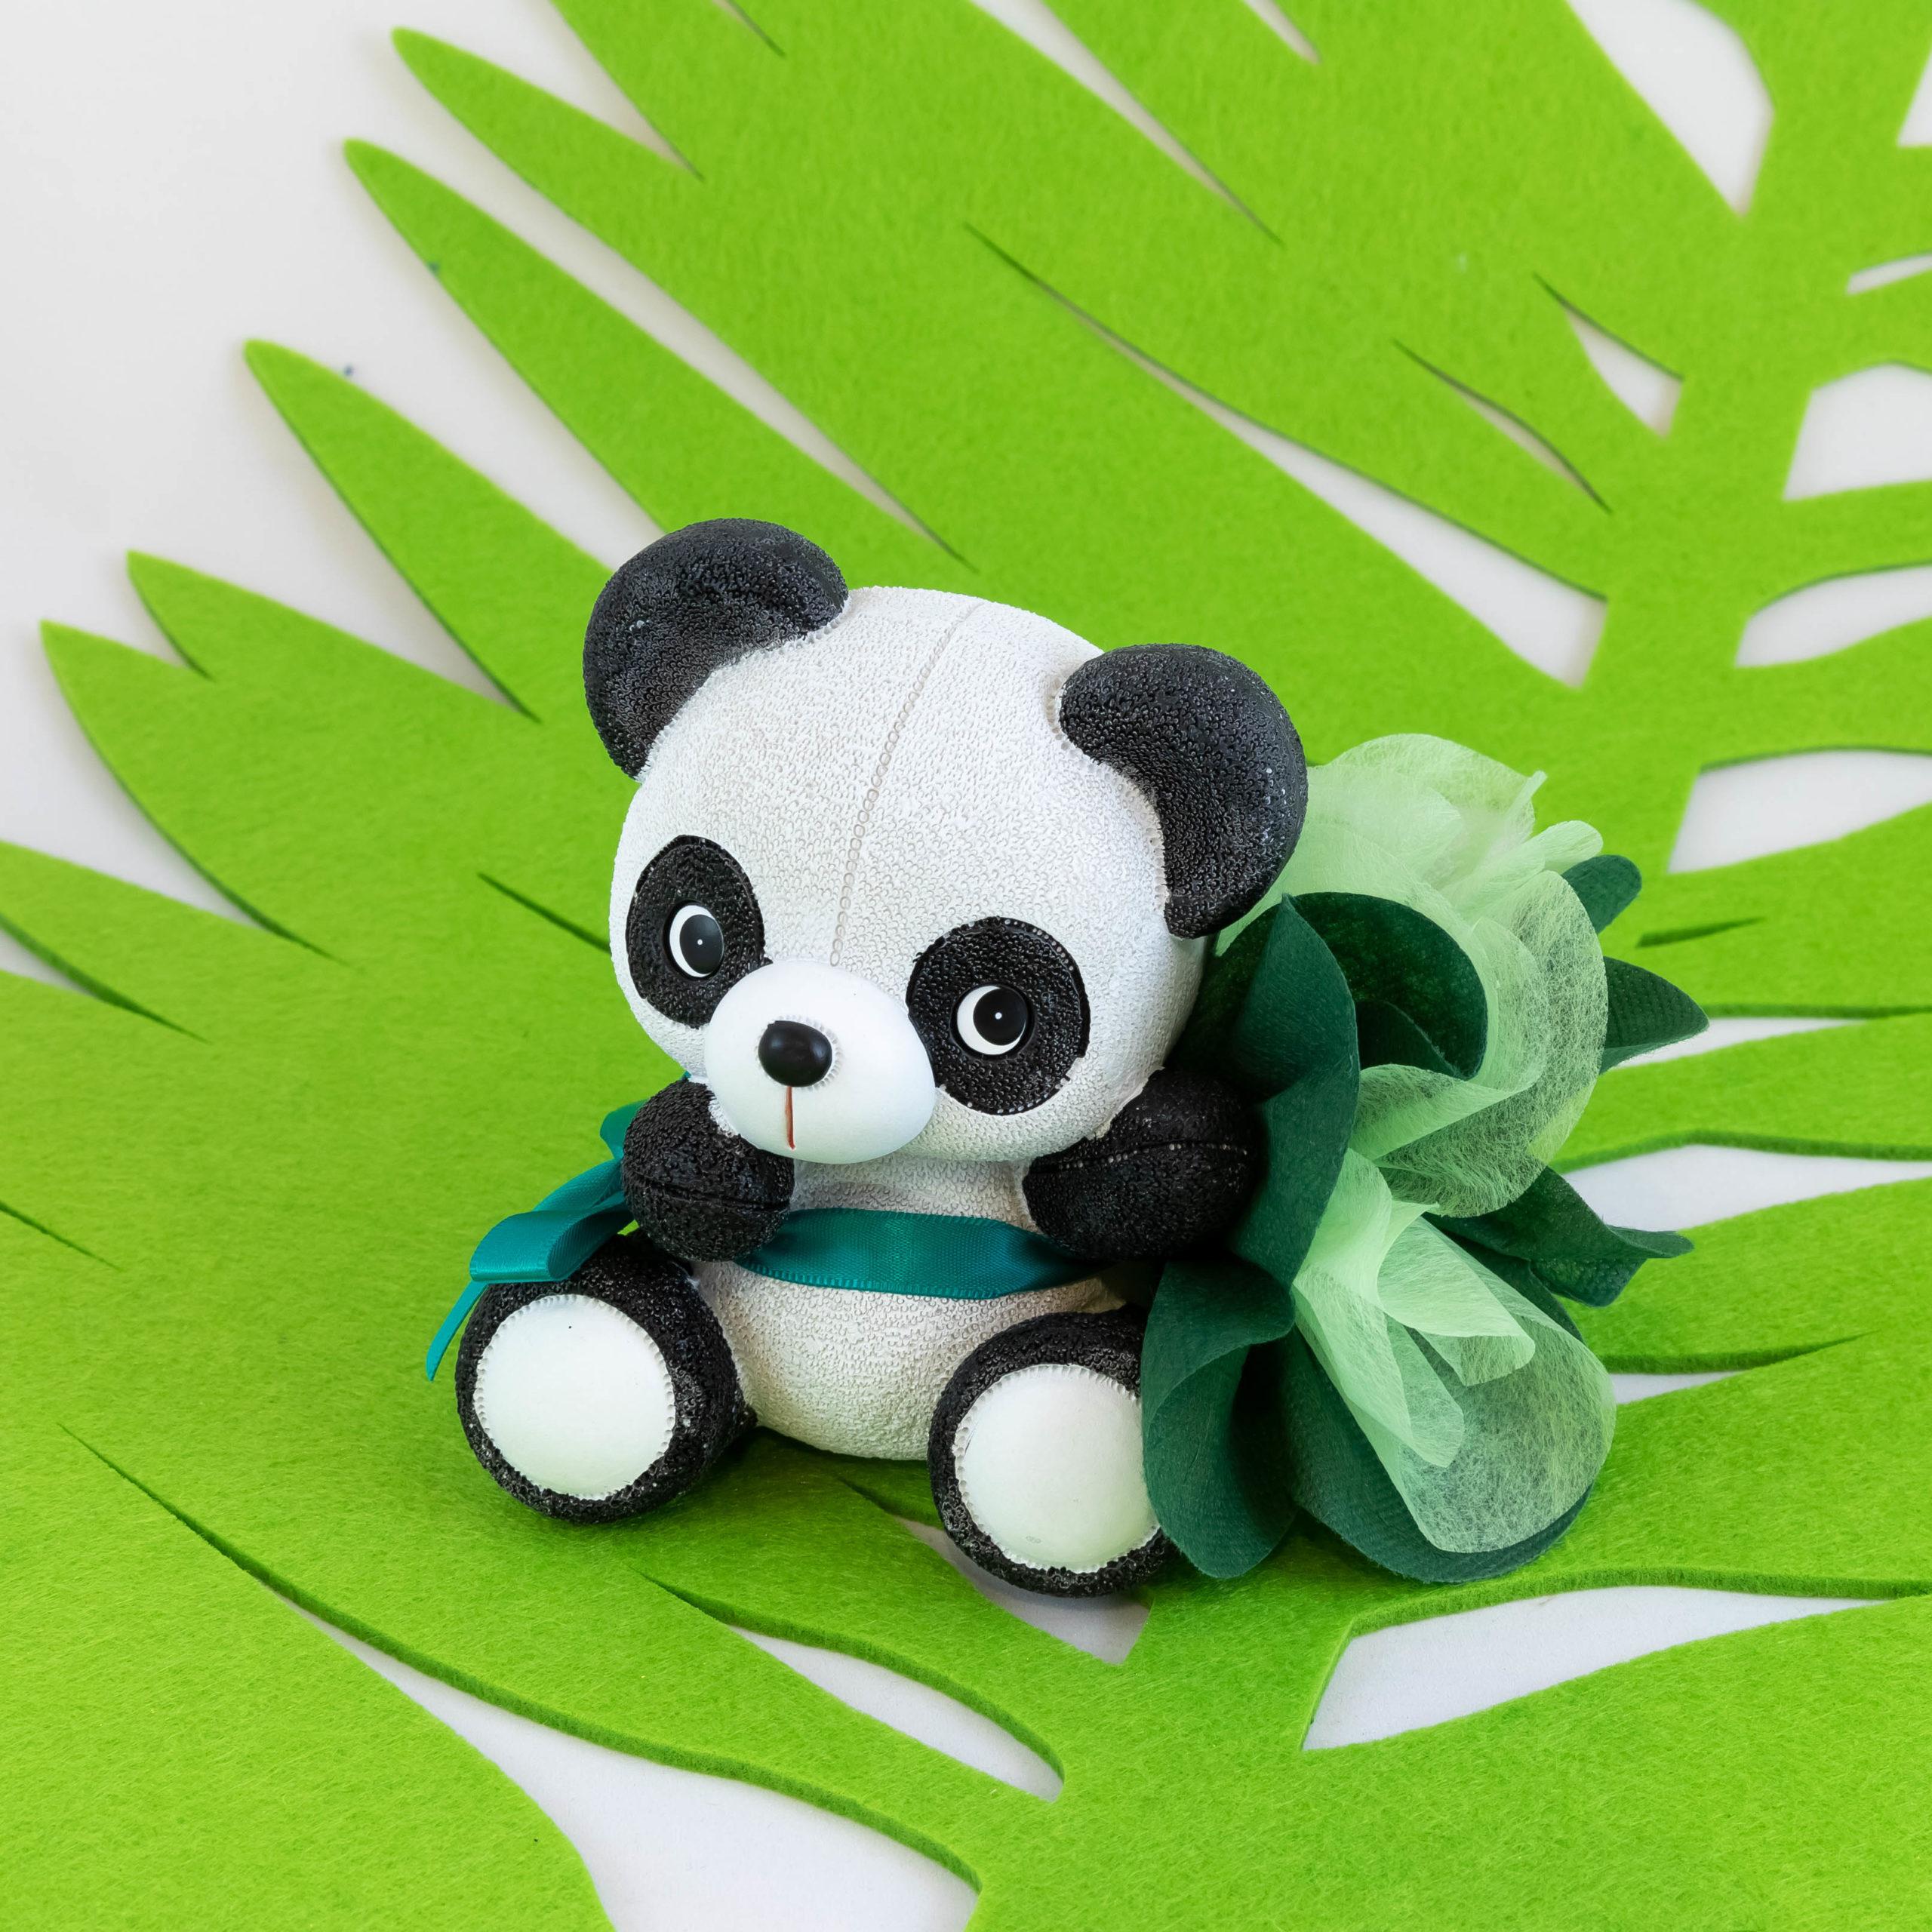 Tirelire - Panda Image